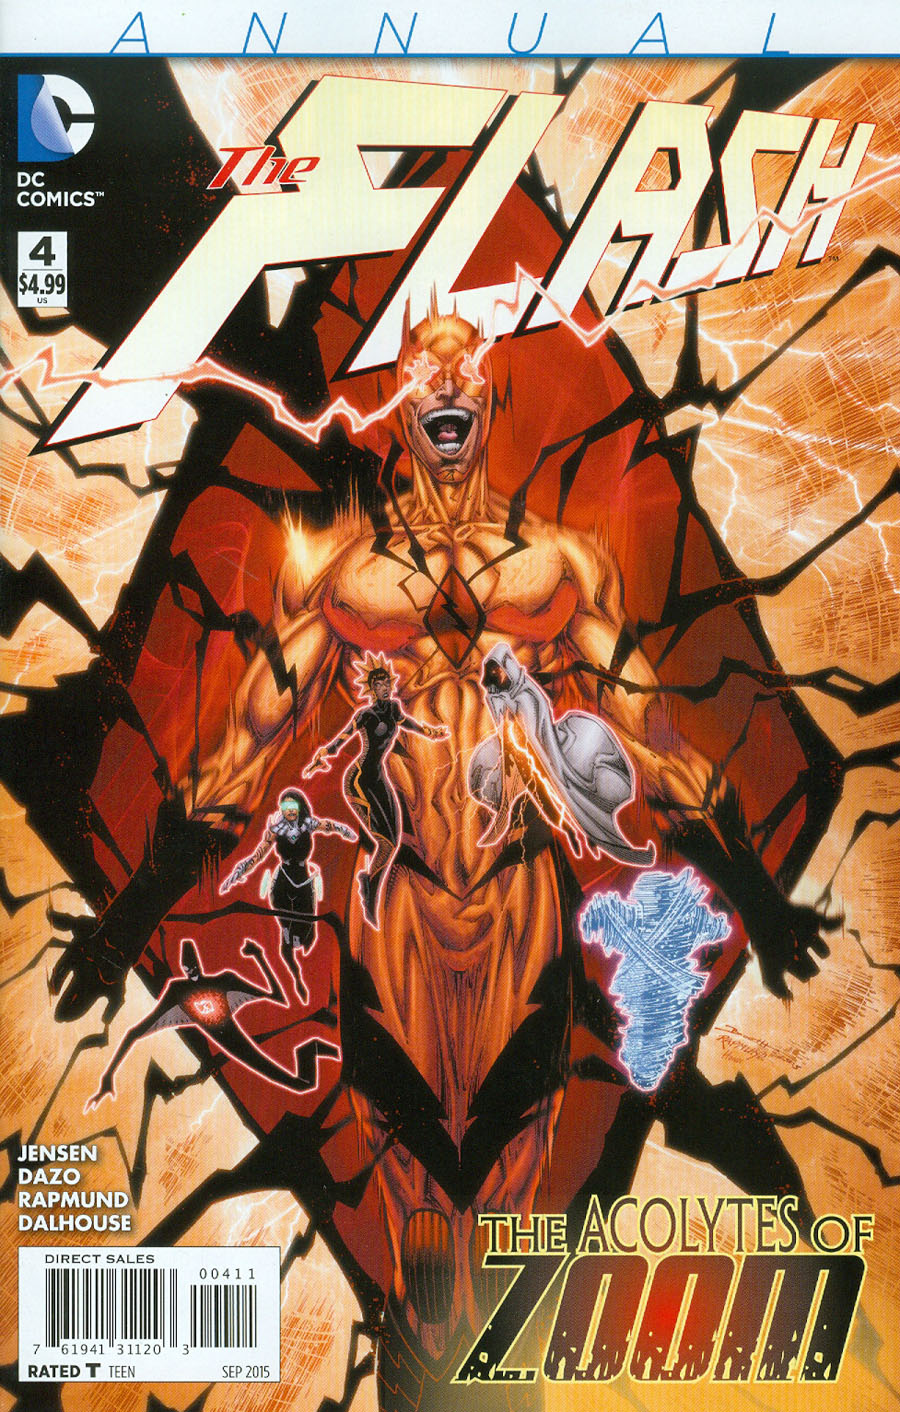 Flash Vol 4 Annual #4